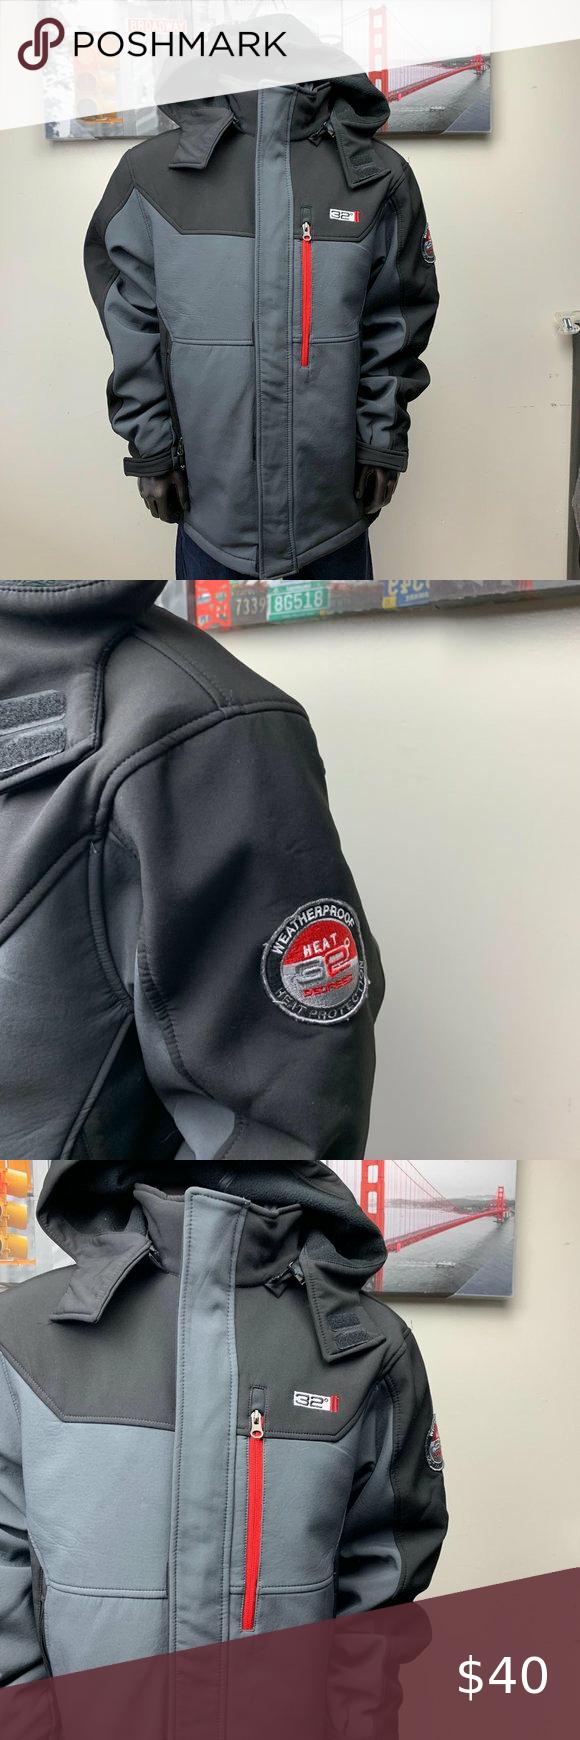 32 Degrees Weatherproof Boys Jacket Coat 32 Degrees Weatherproof Boys Coat Jacket Size Large 14 16 New Without Tags I Bo In 2020 Boys Jacket Boys Coat Coats Jackets [ 1740 x 580 Pixel ]